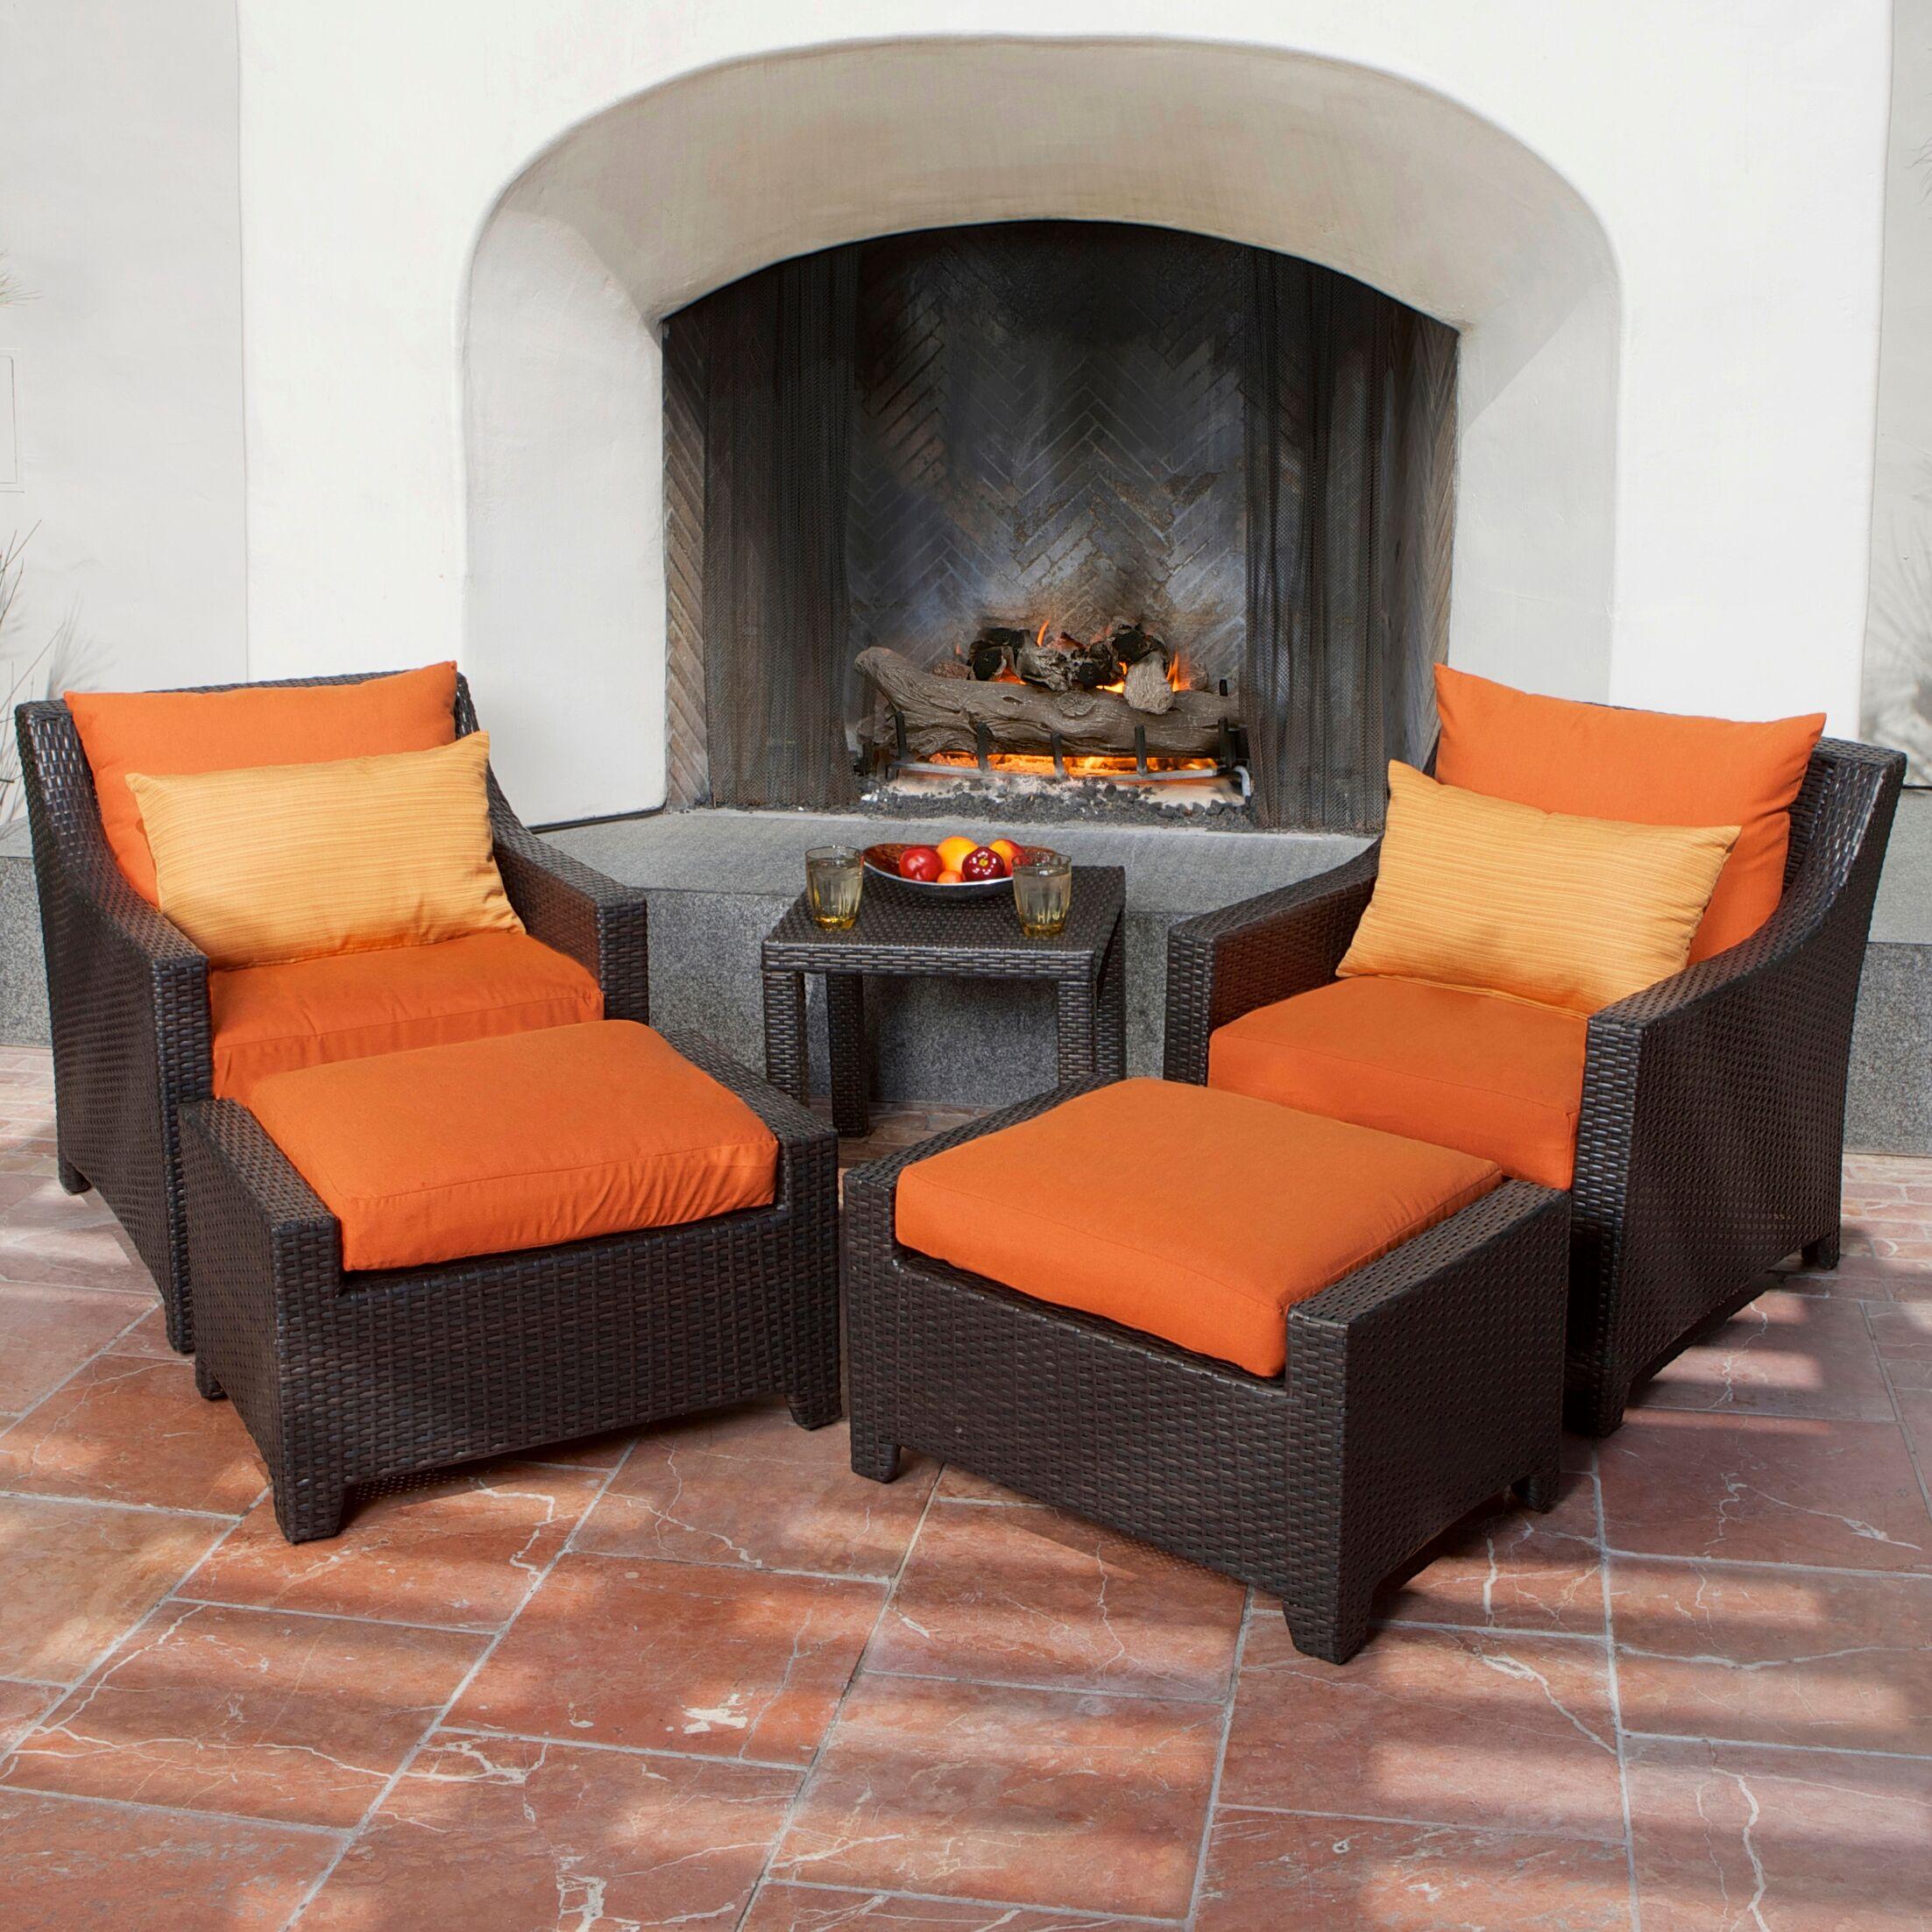 Northridge 5 Piece Conversation Set with Cushions Fabric: Tika Orange